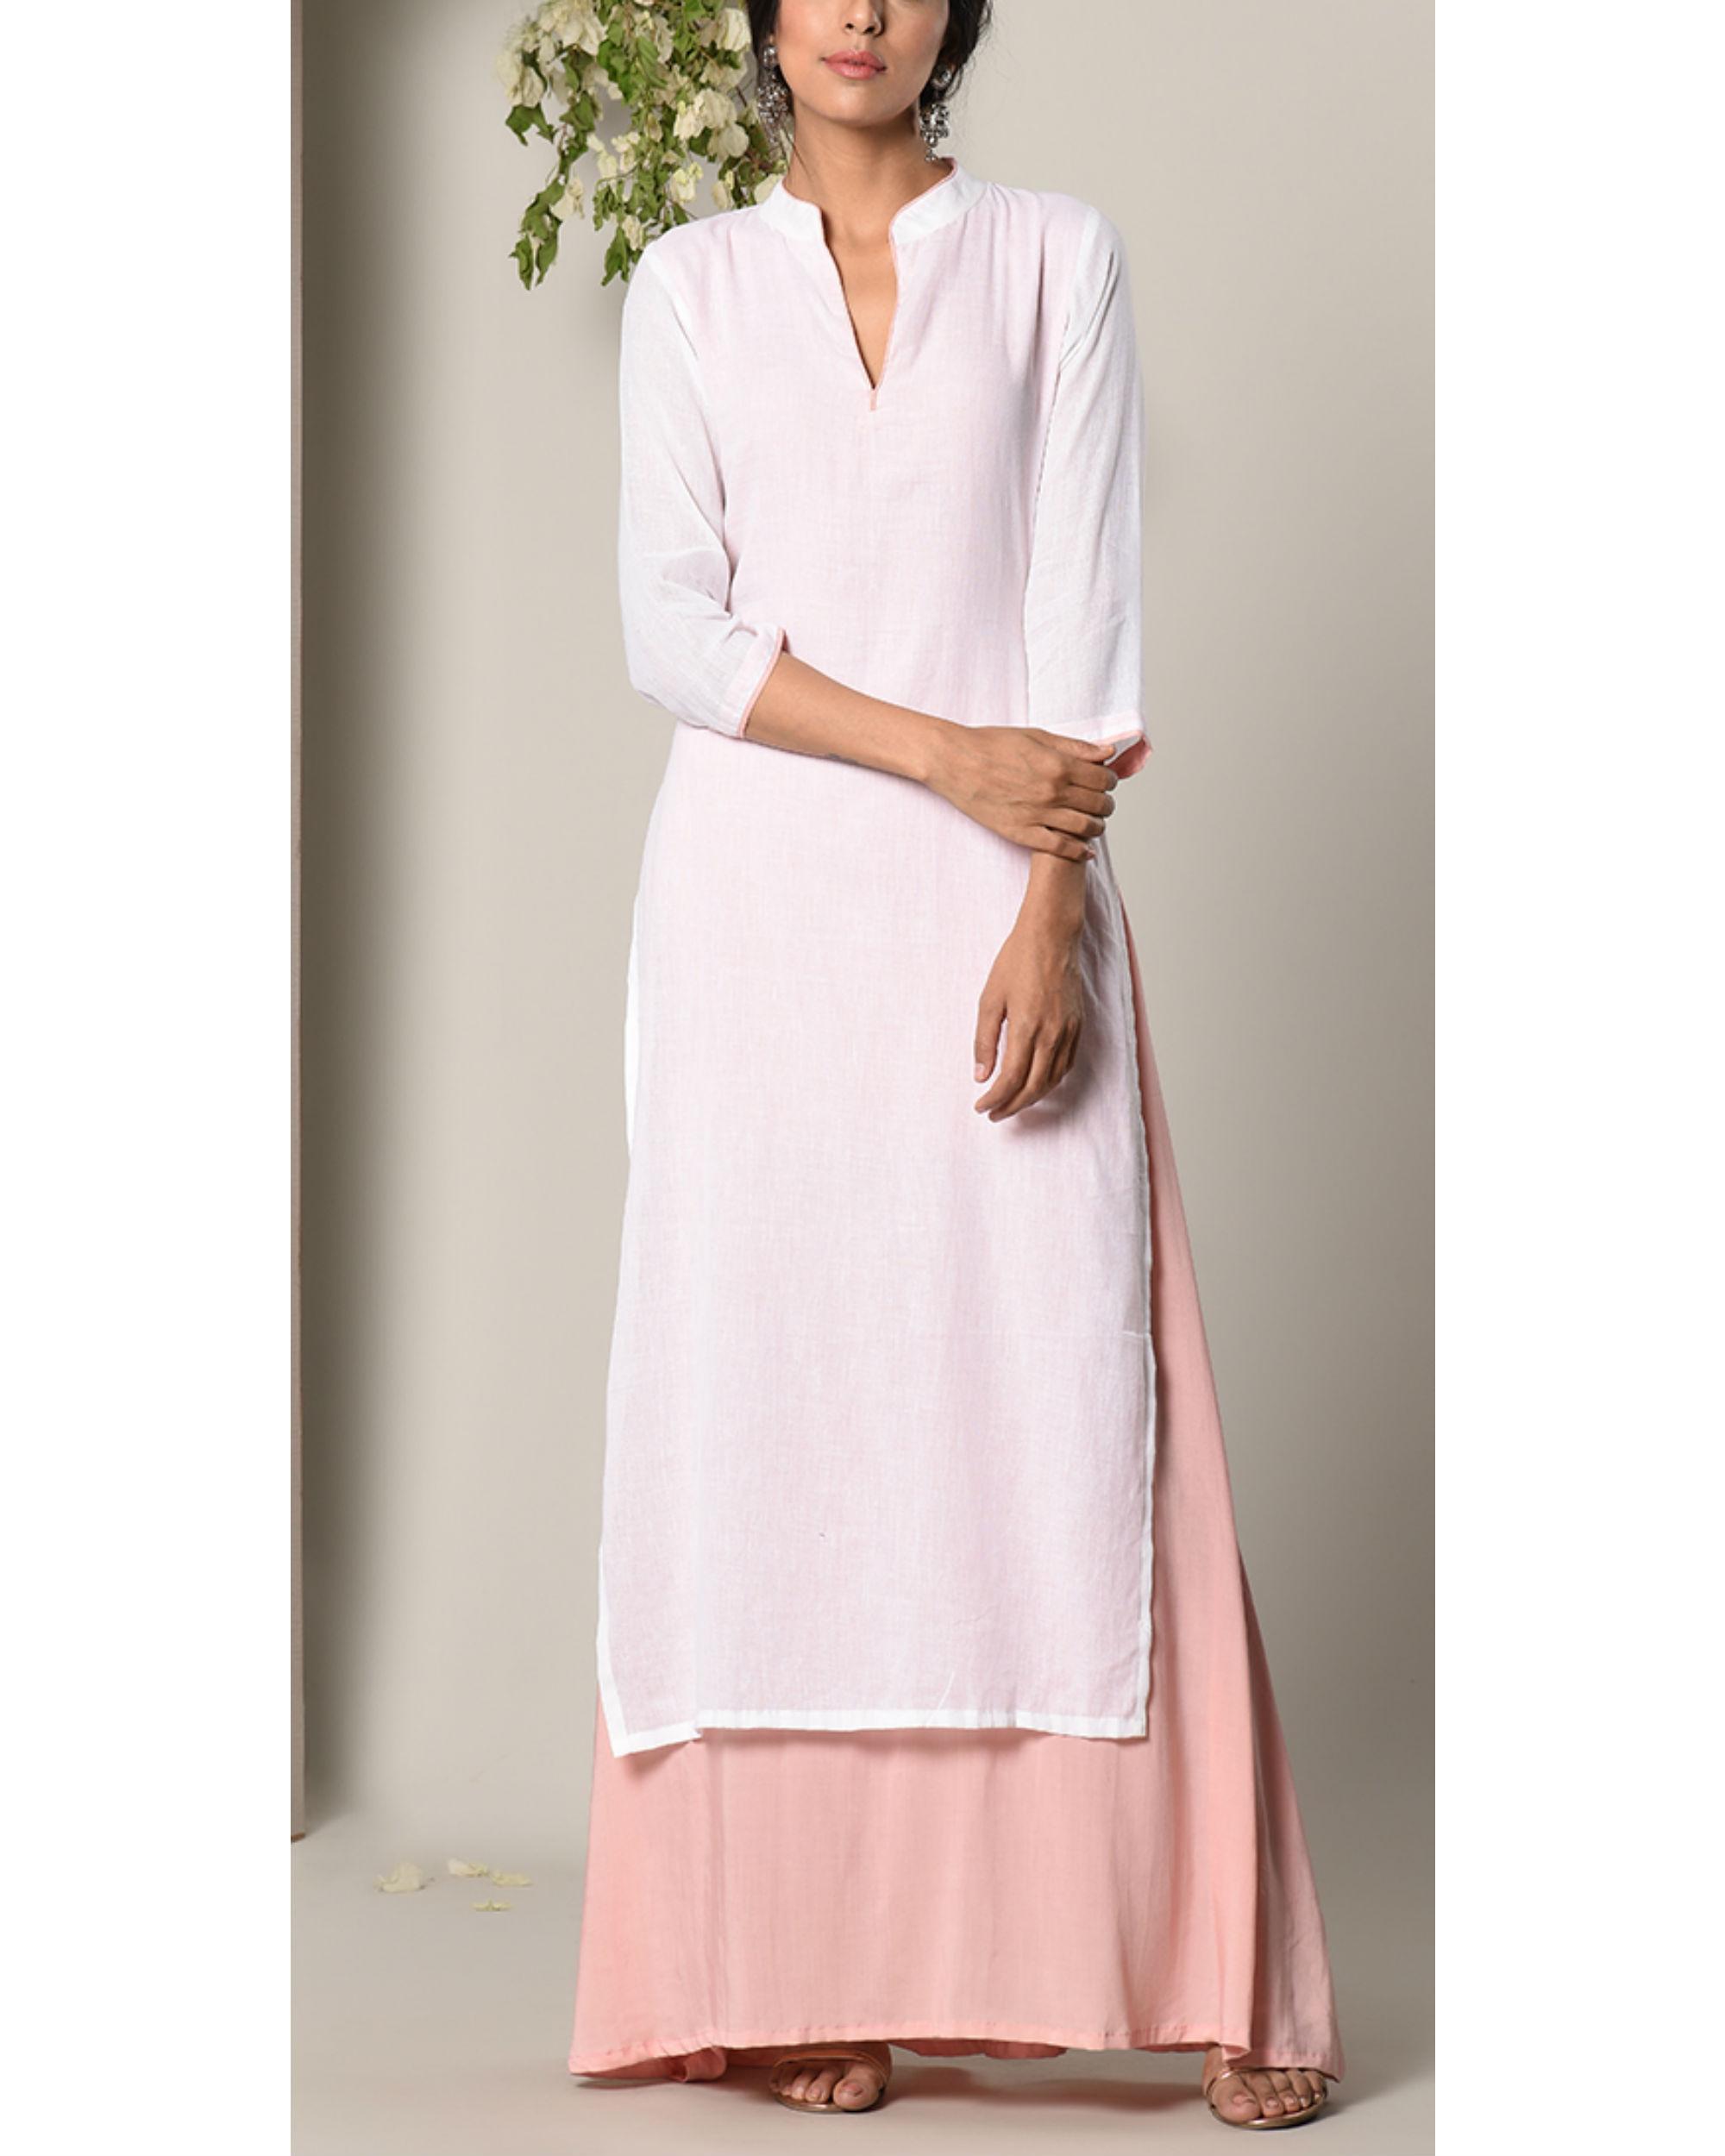 Mud pink layer dress